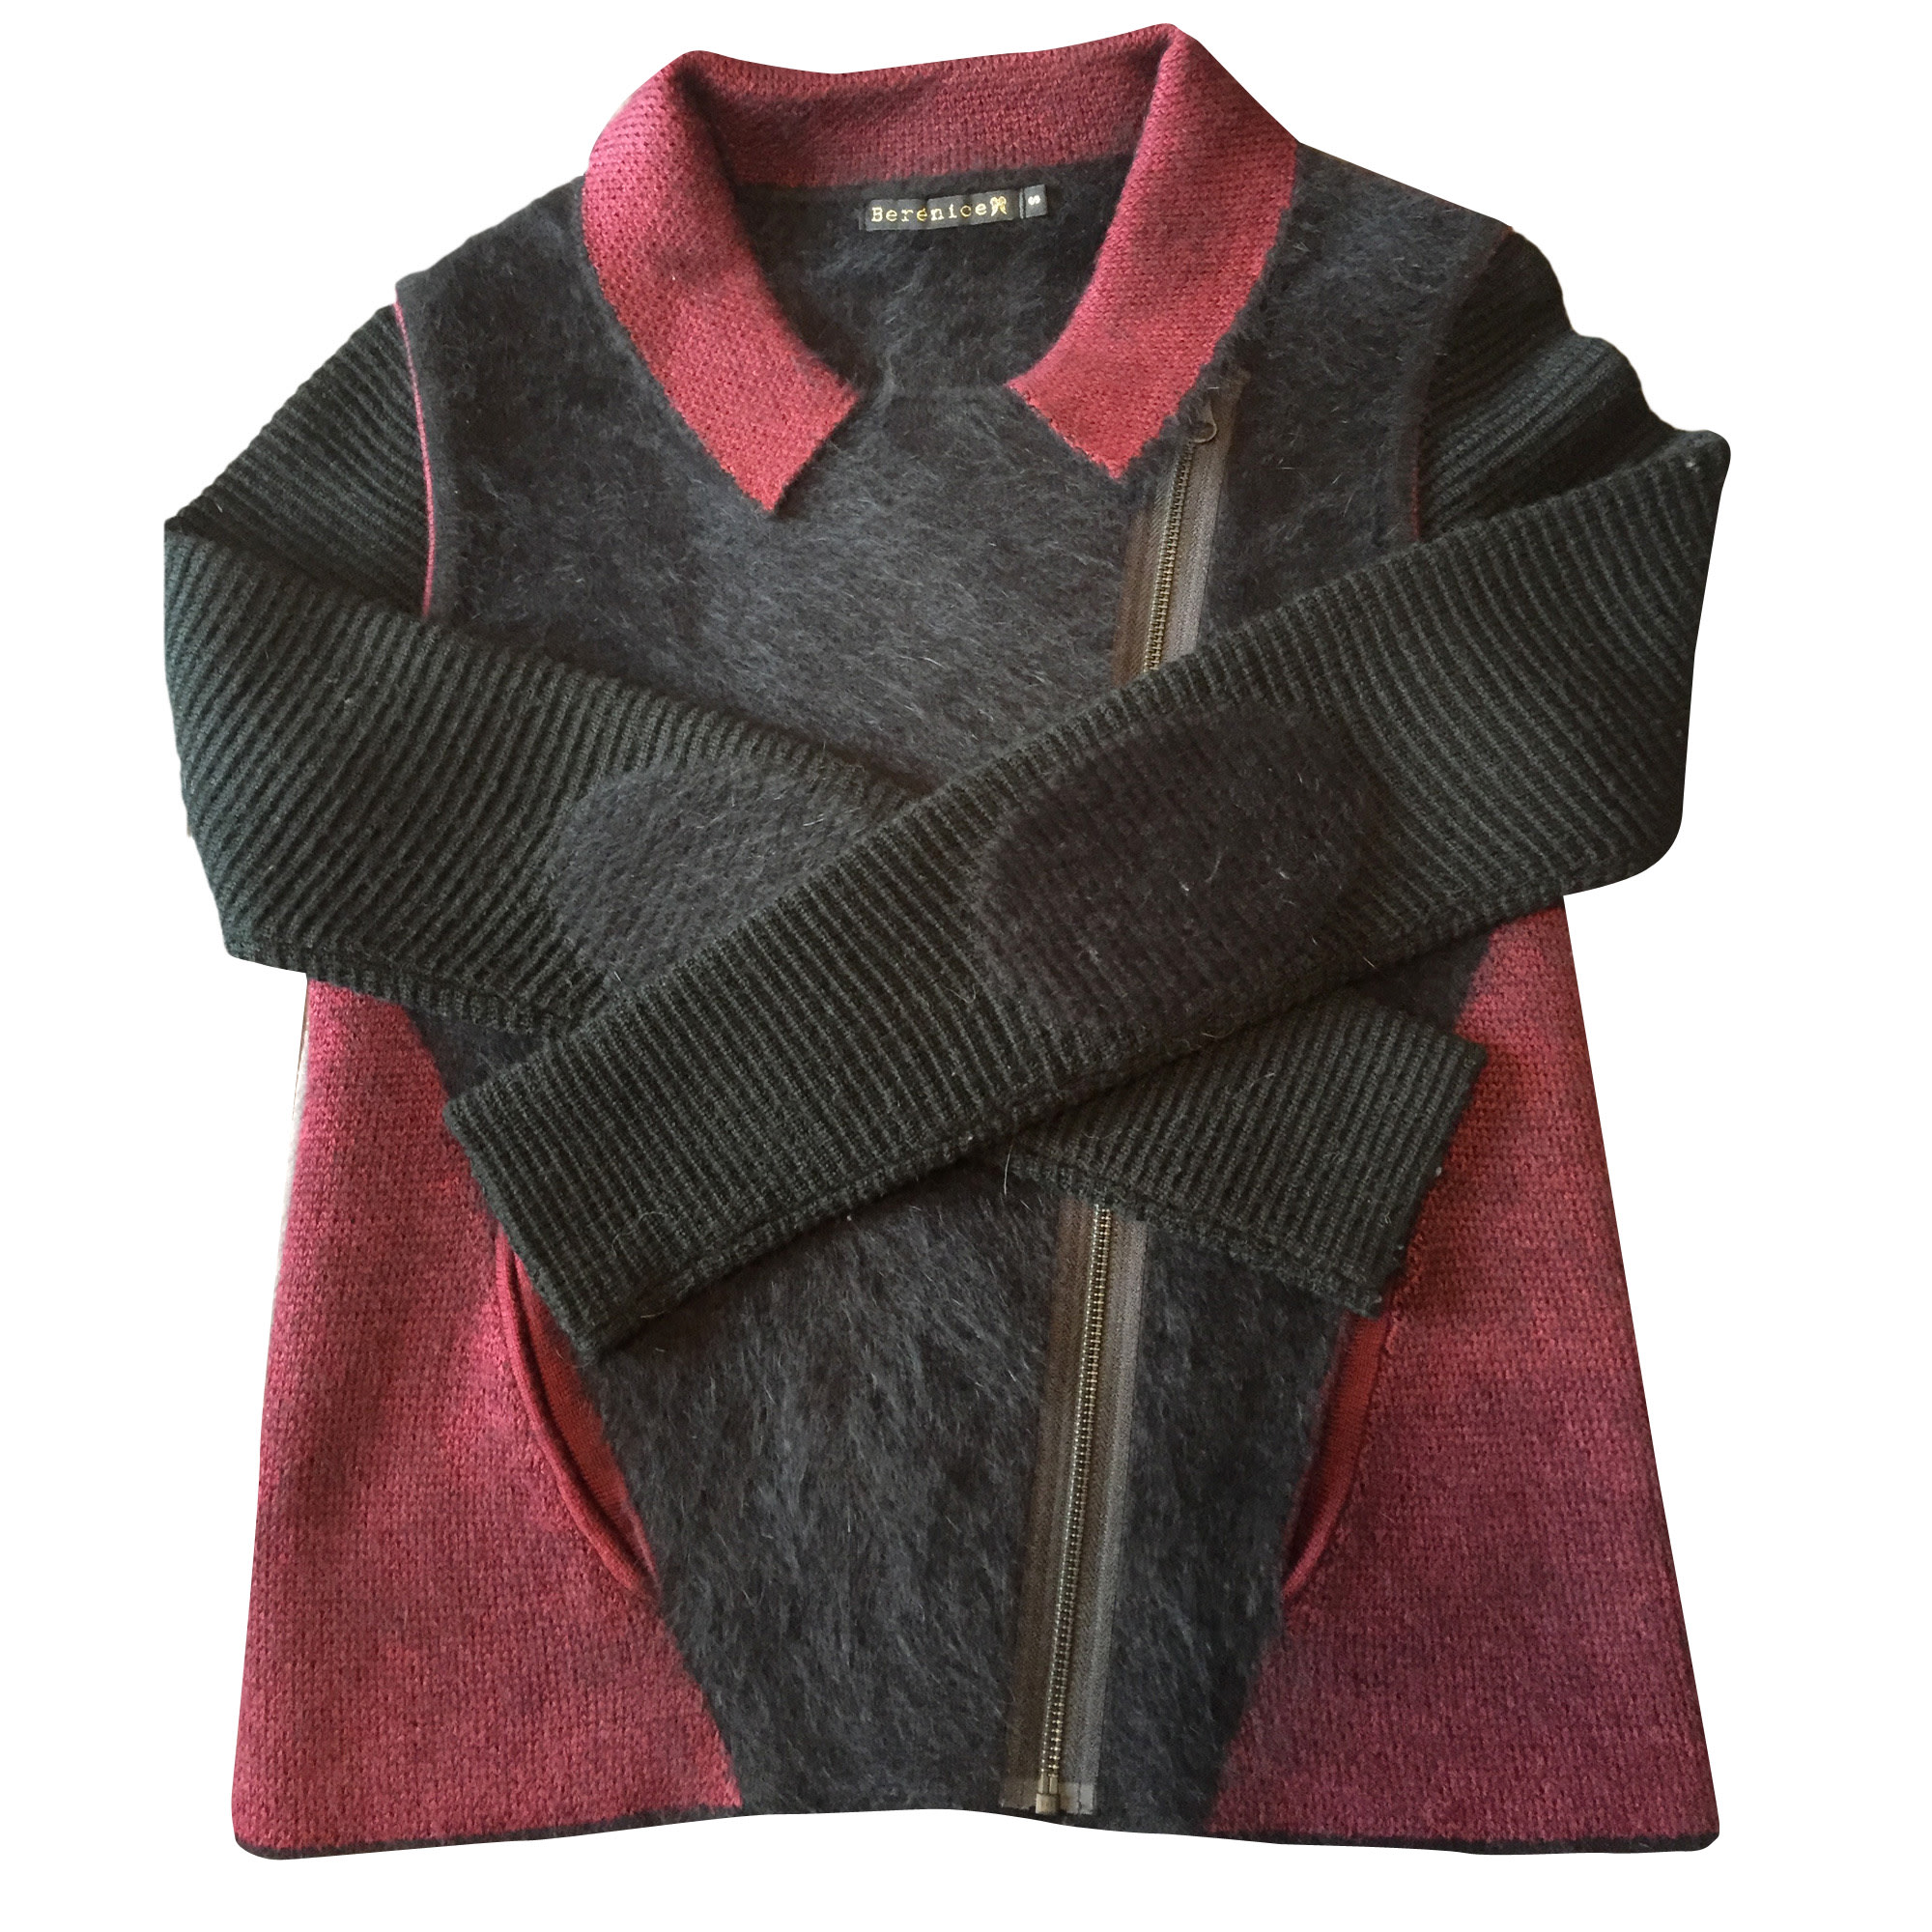 Gilet, cardigan BERENICE Rouge, bordeaux